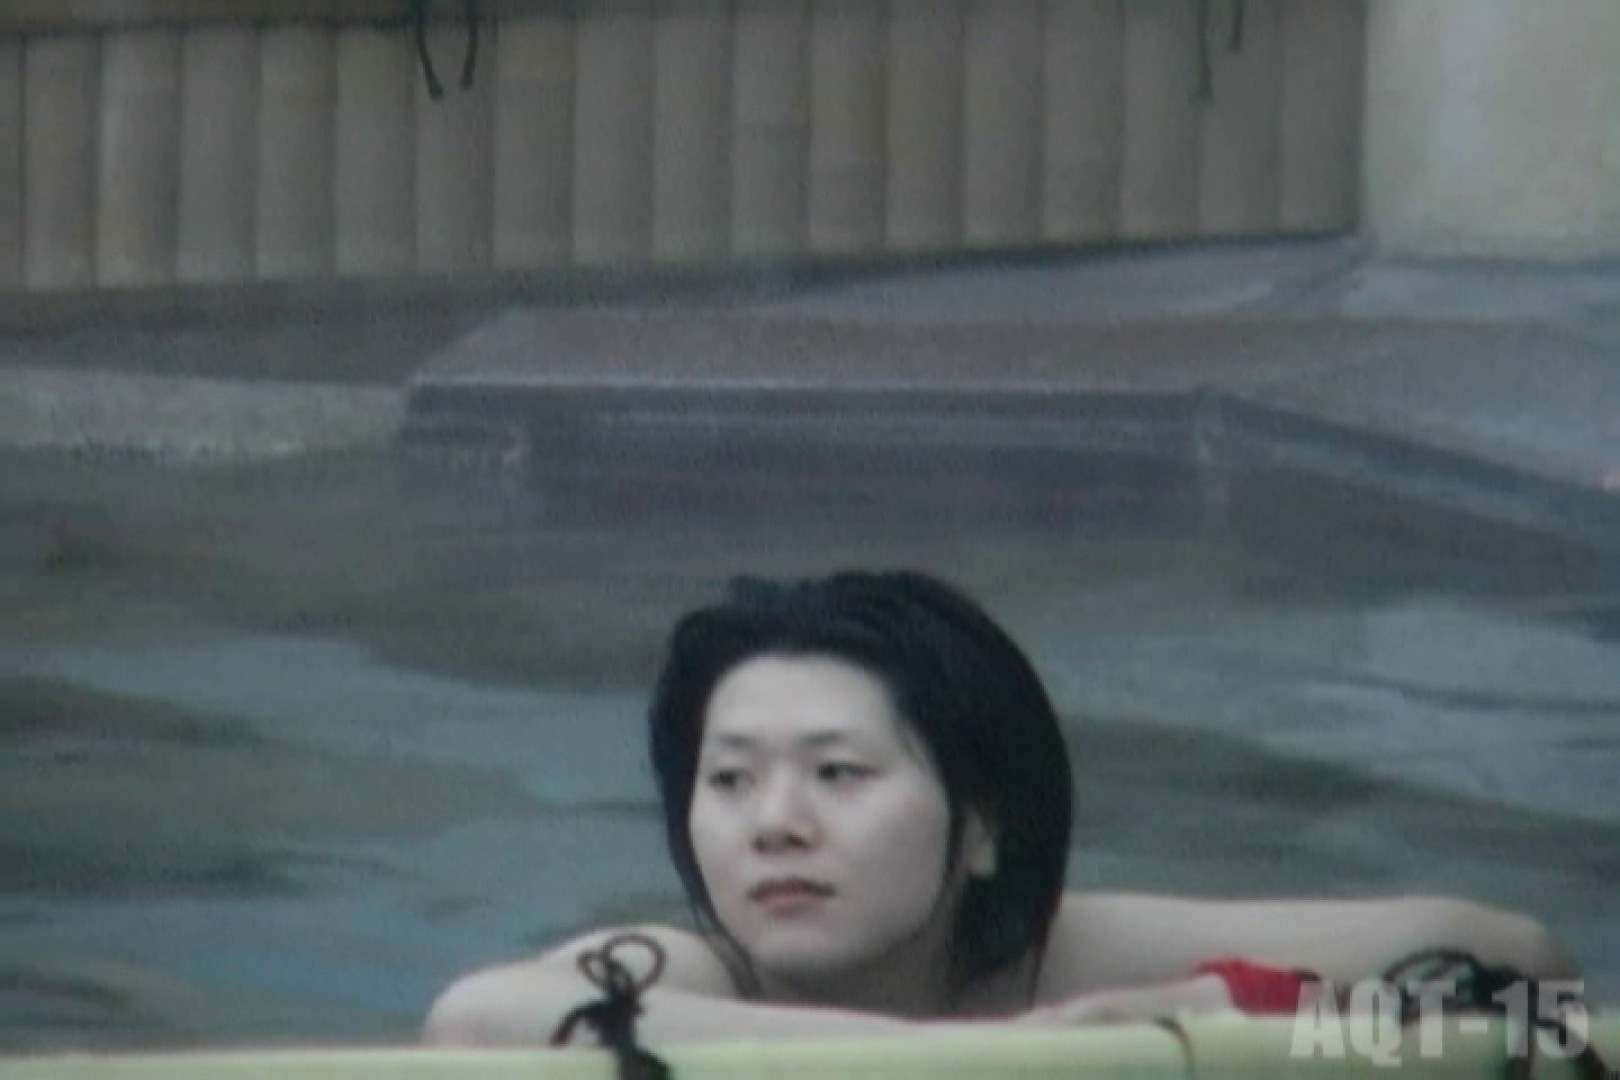 Aquaな露天風呂Vol.837 盗撮シリーズ   露天風呂編  106PIX 65